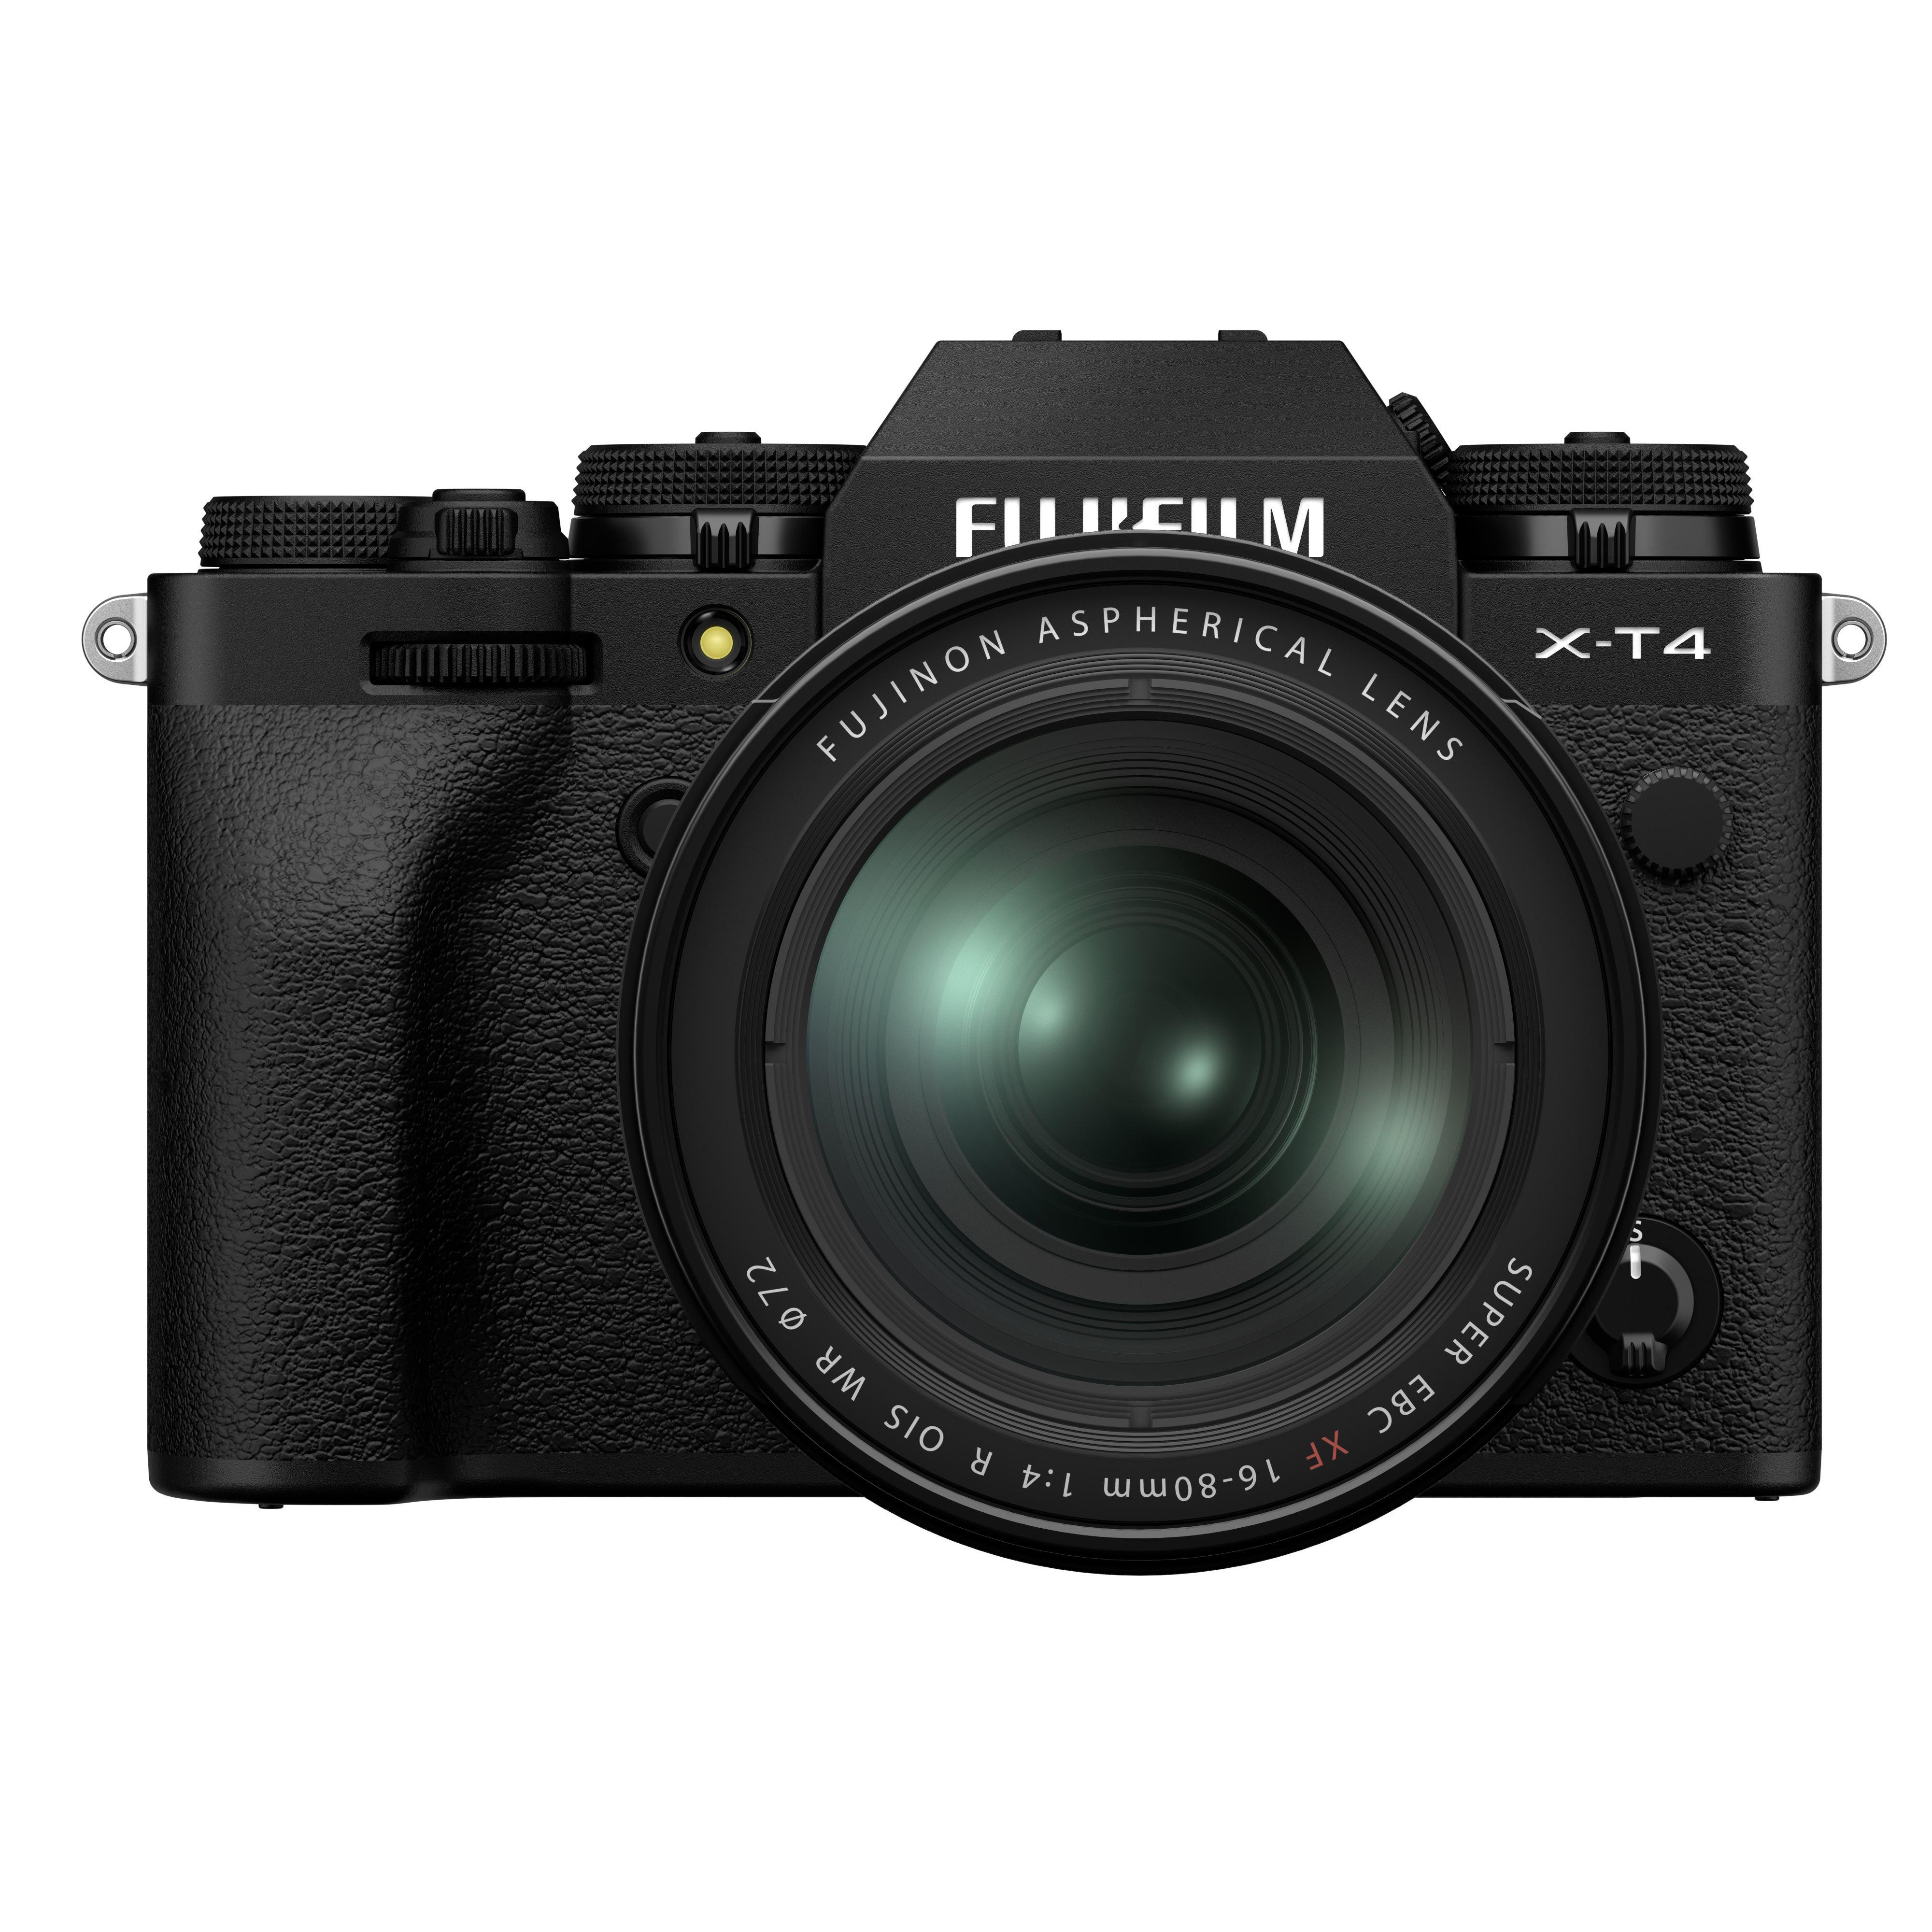 Fujifilm X-T4 Digital Camera with XF 16-80mm Lens - Black